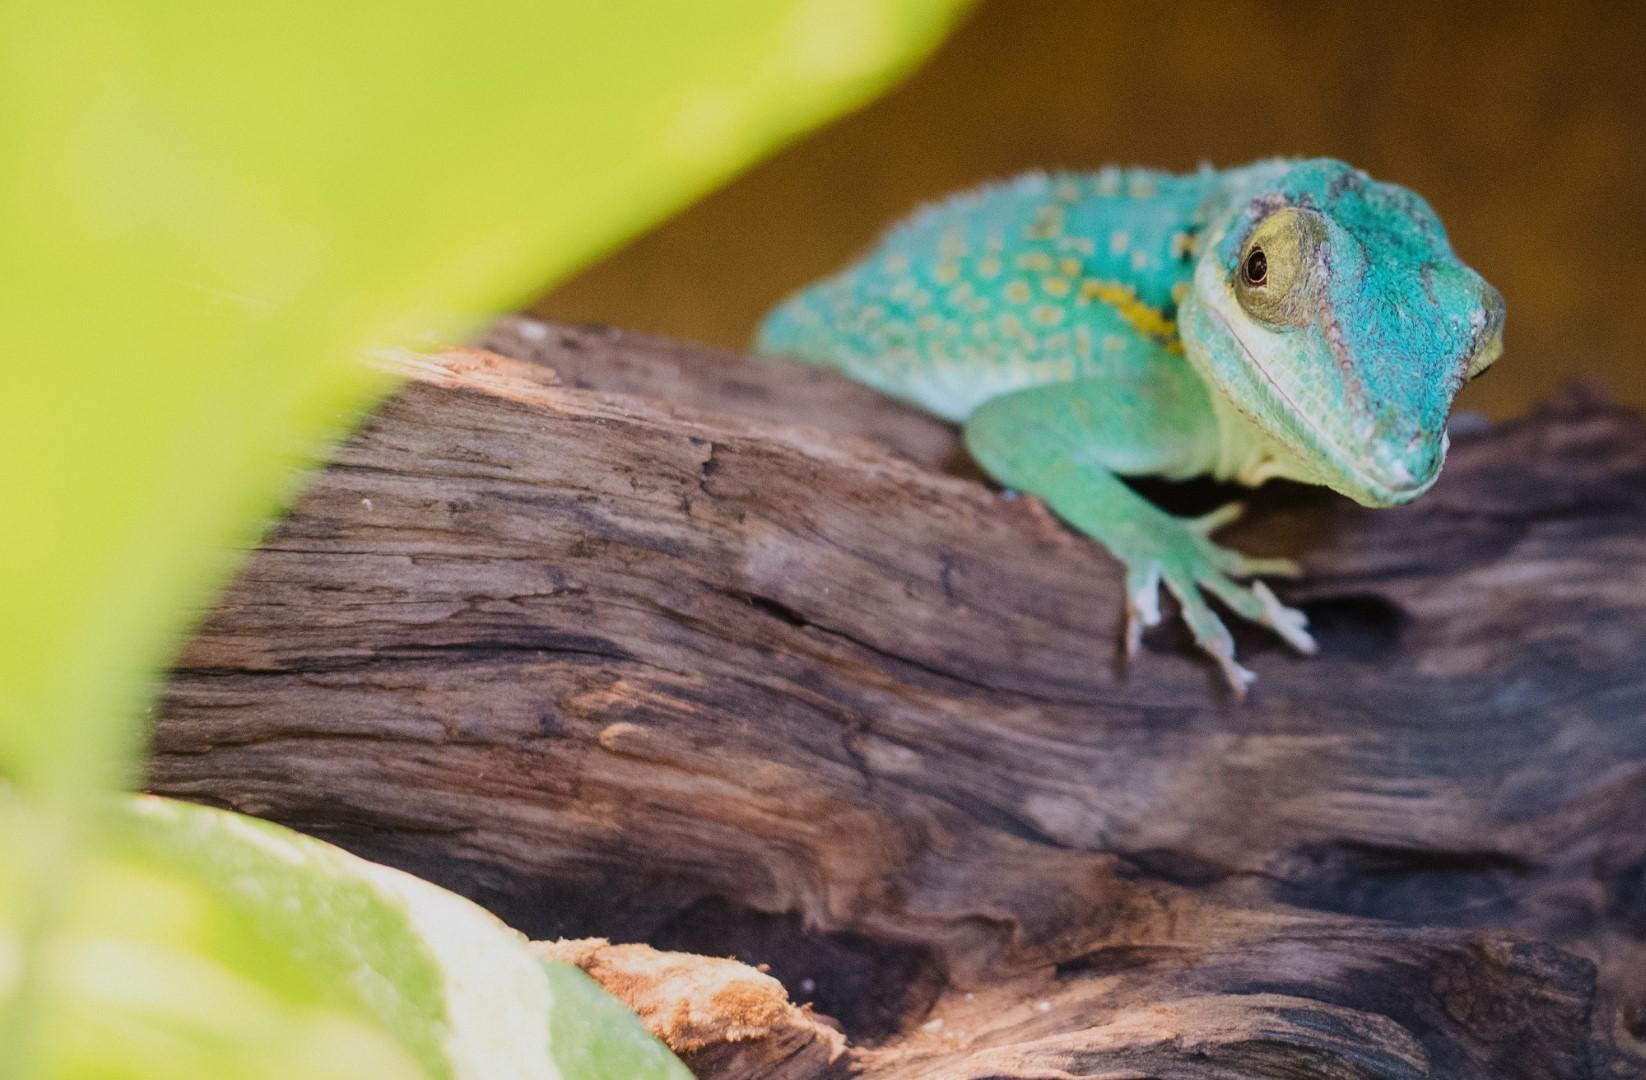 Close-up of a lizard in Baracoa Cuba